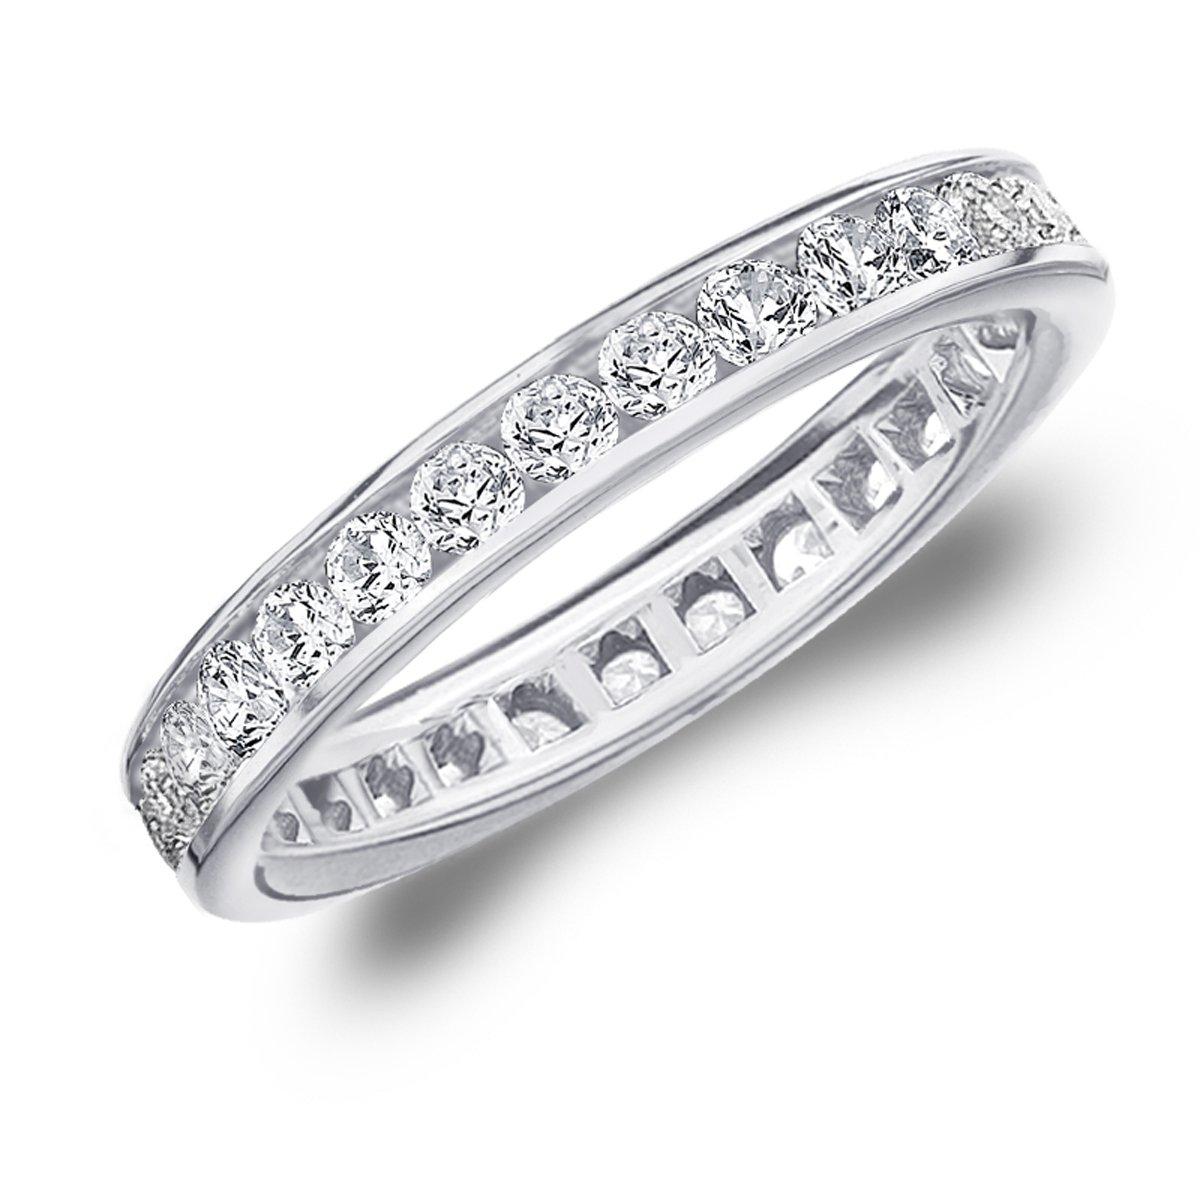 1 Carat Eternity Ring in 10K White Gold, Diamond Eternity Anniversary Wedding Band, Size 4.5